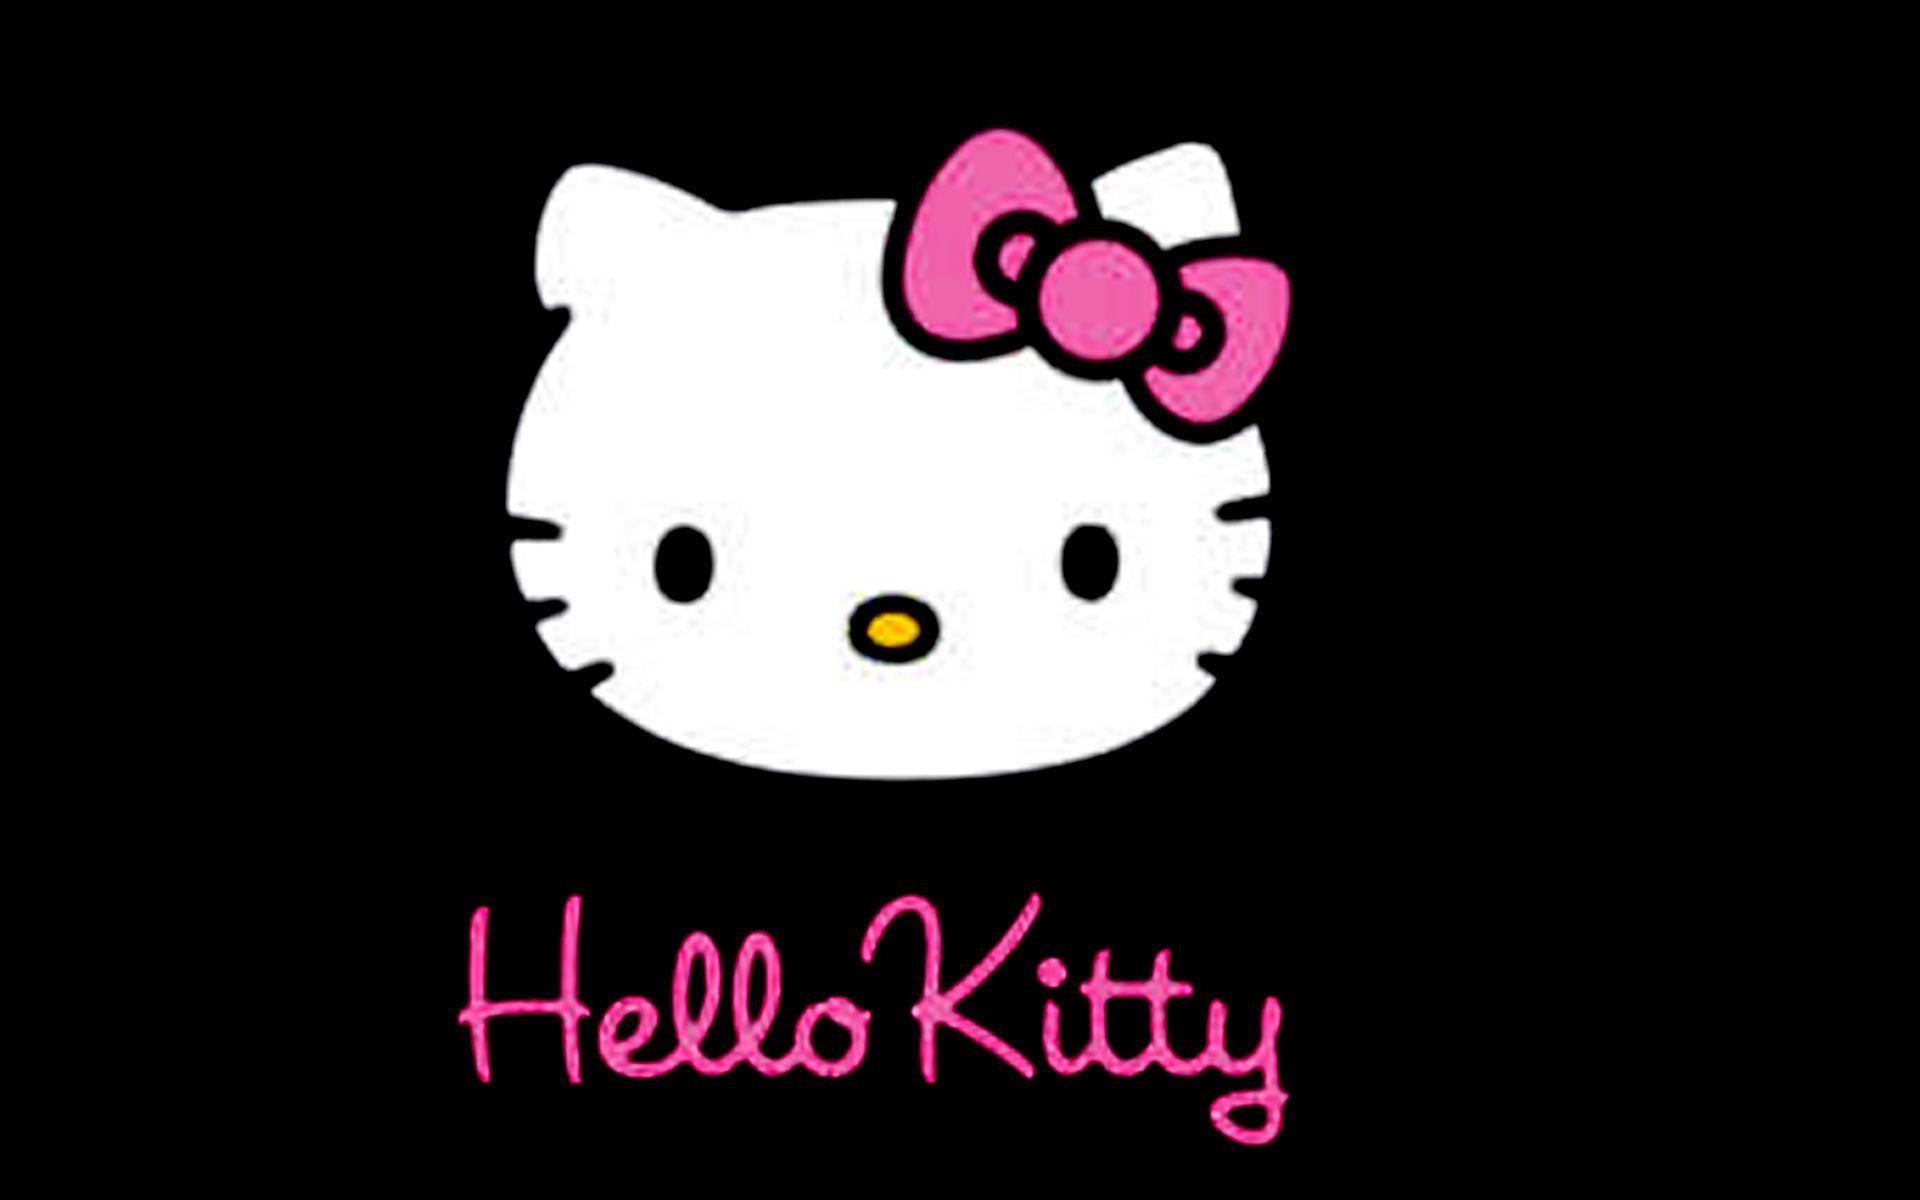 Beautiful Wallpaper Hello Kitty Neon - 477223-hello-kitty-screensavers-and-wallpapers-1920x1200-laptop  HD_754815.jpg